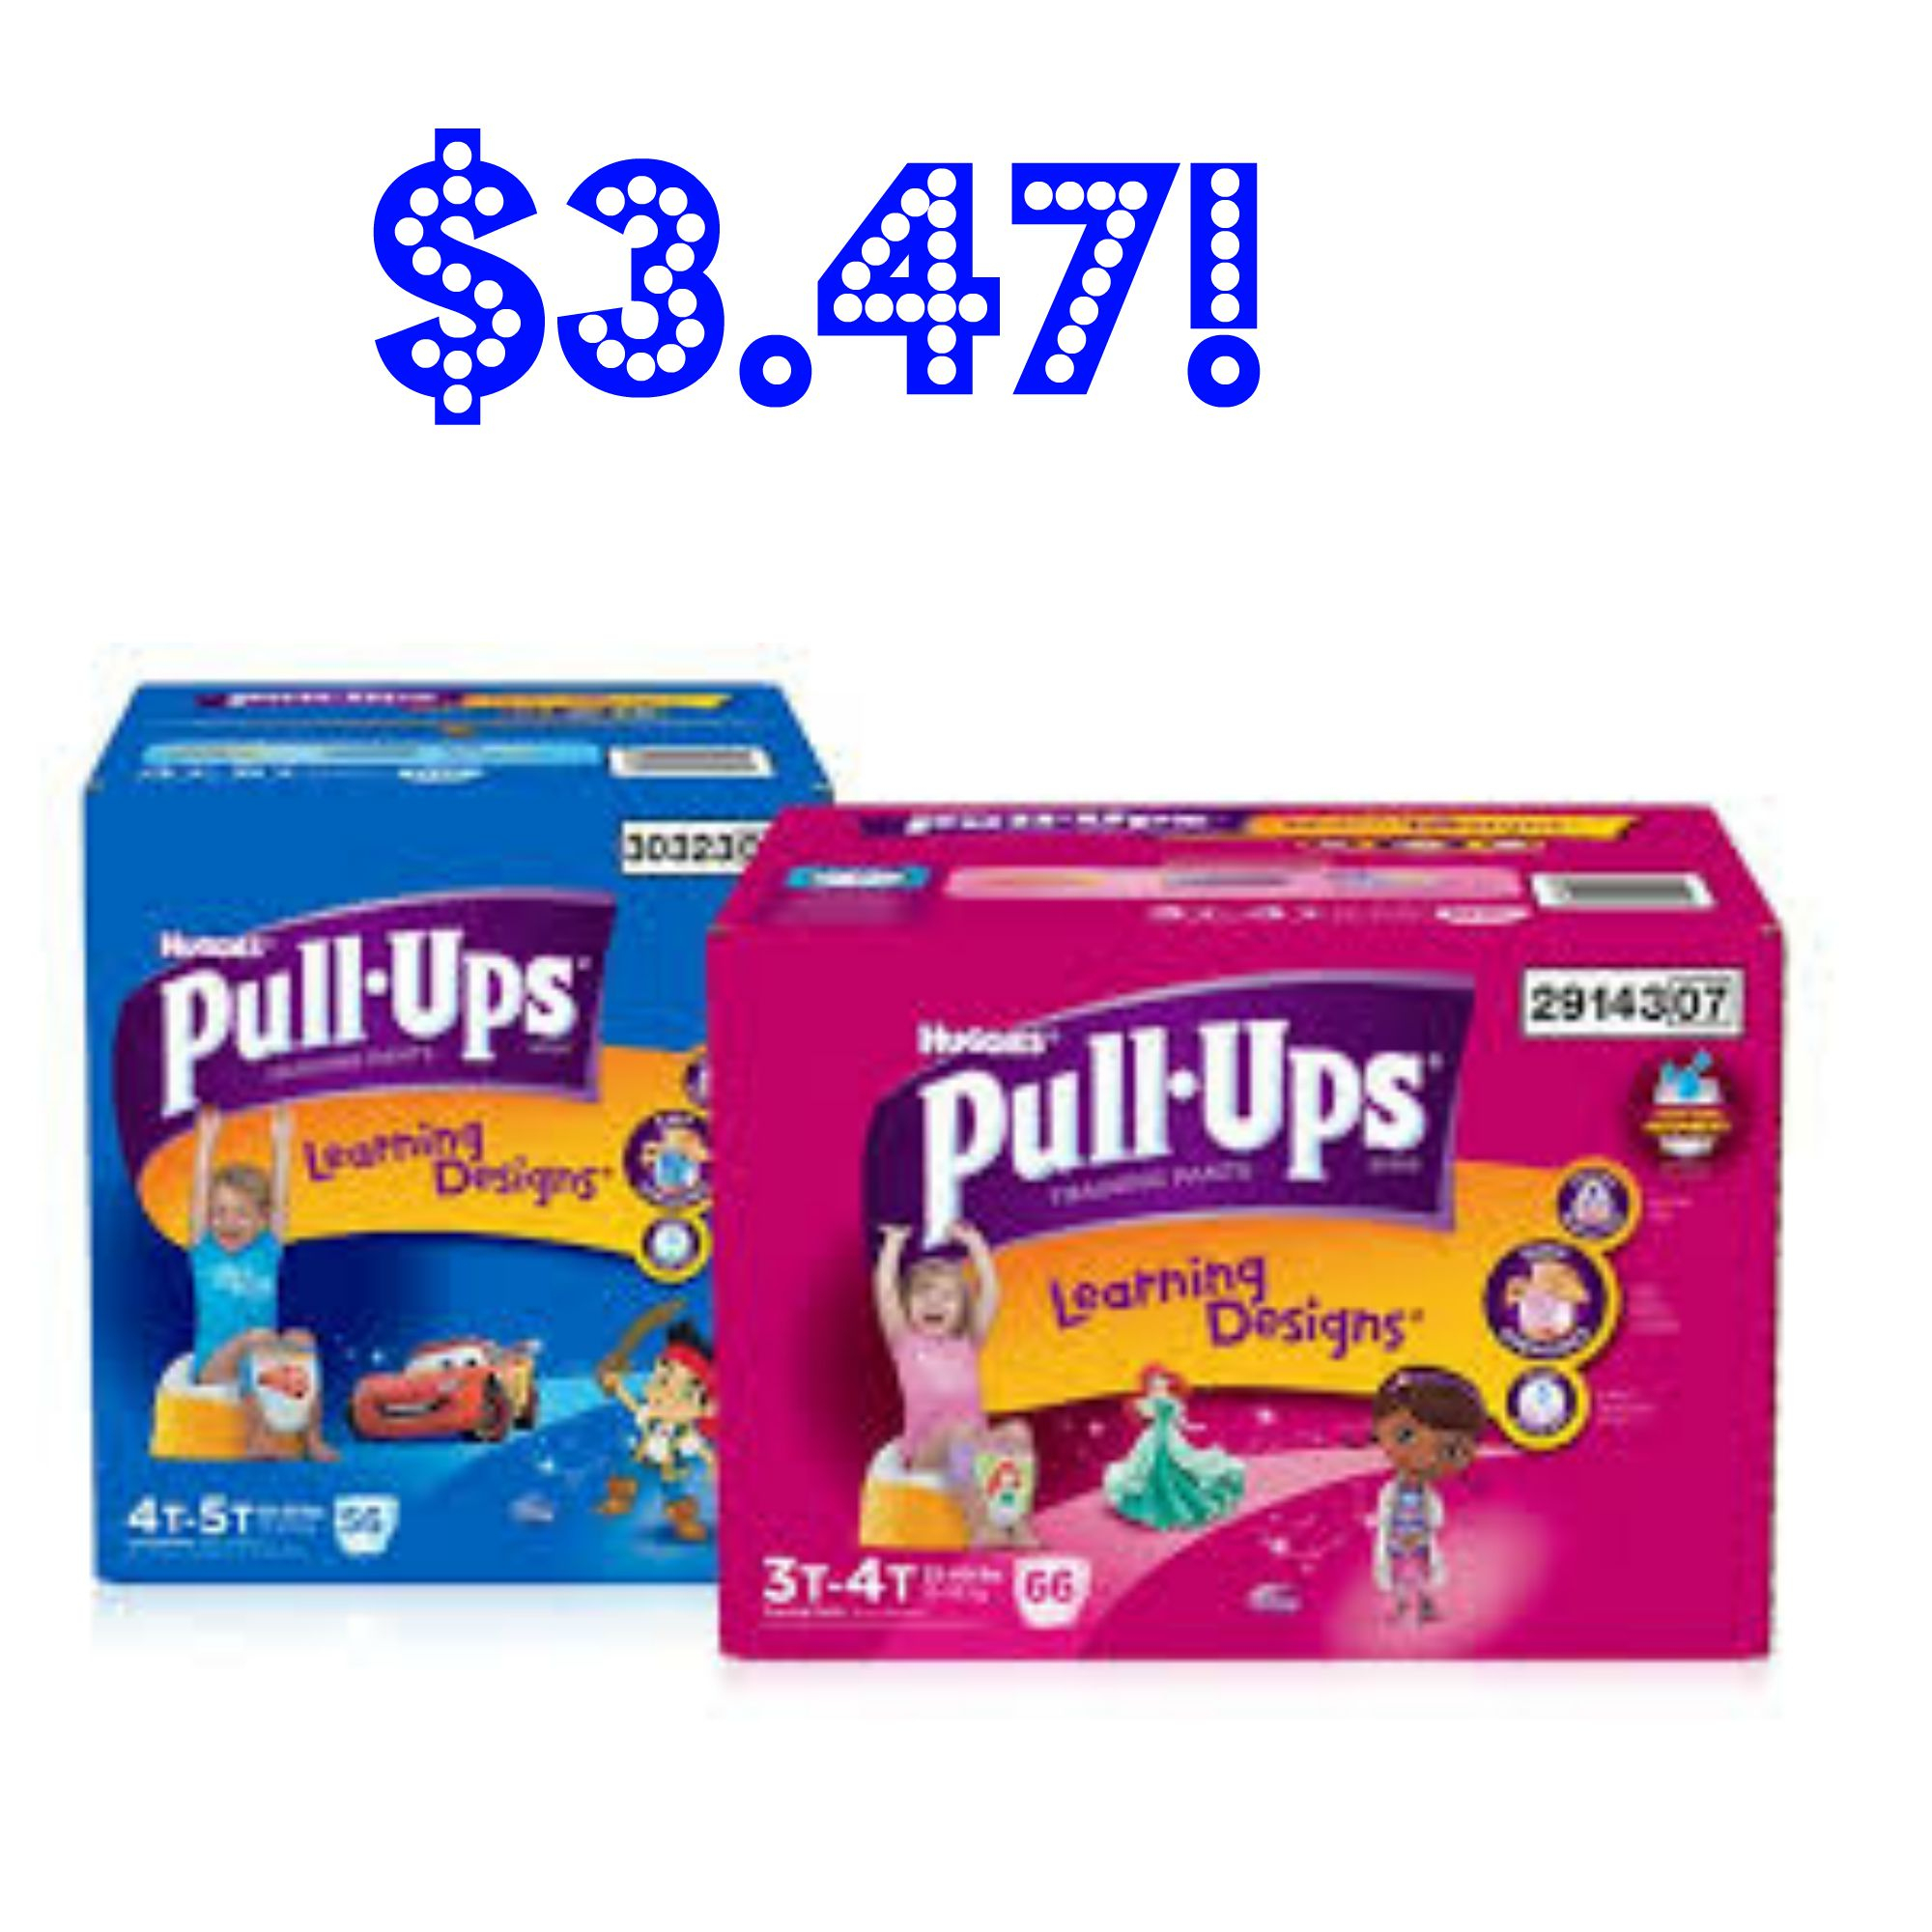 Walmart: Huggies Pull-Ups Training Pants Jumbo Pack Just $3.47! - Free Printable Coupons For Huggies Pull Ups